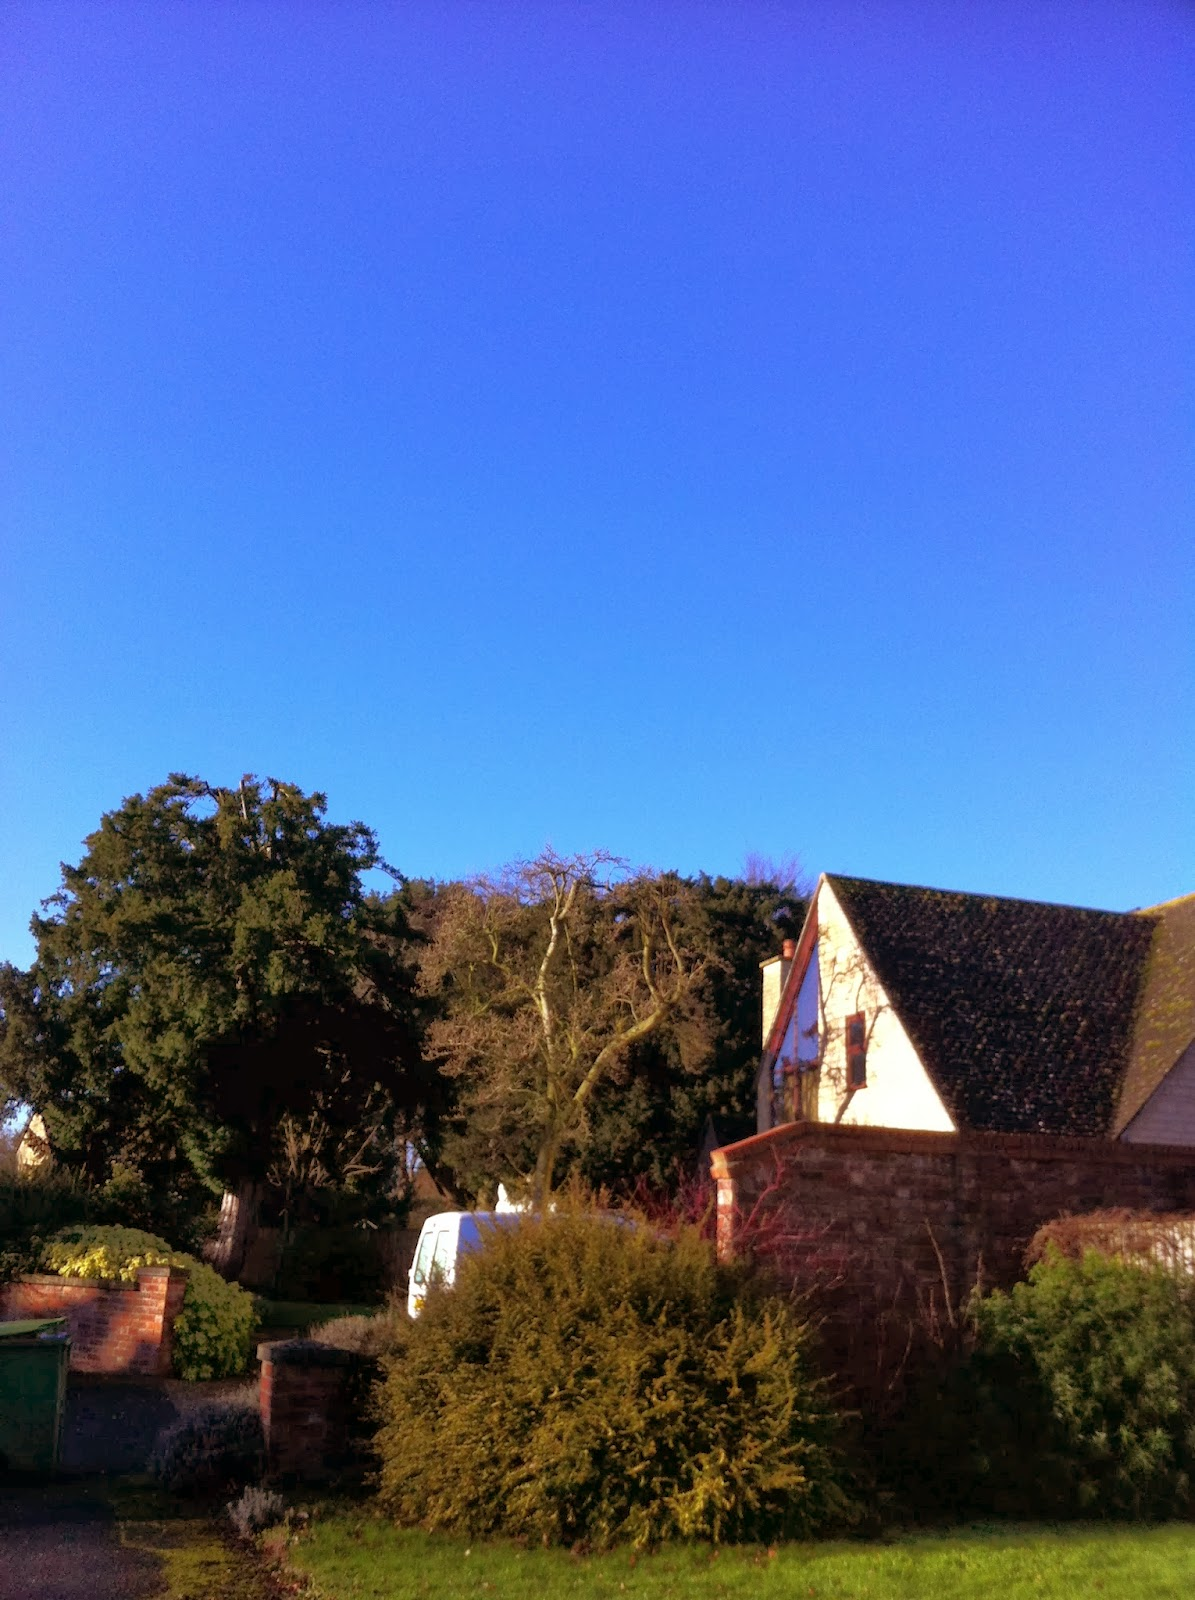 New-house-blue-sky-Gallery